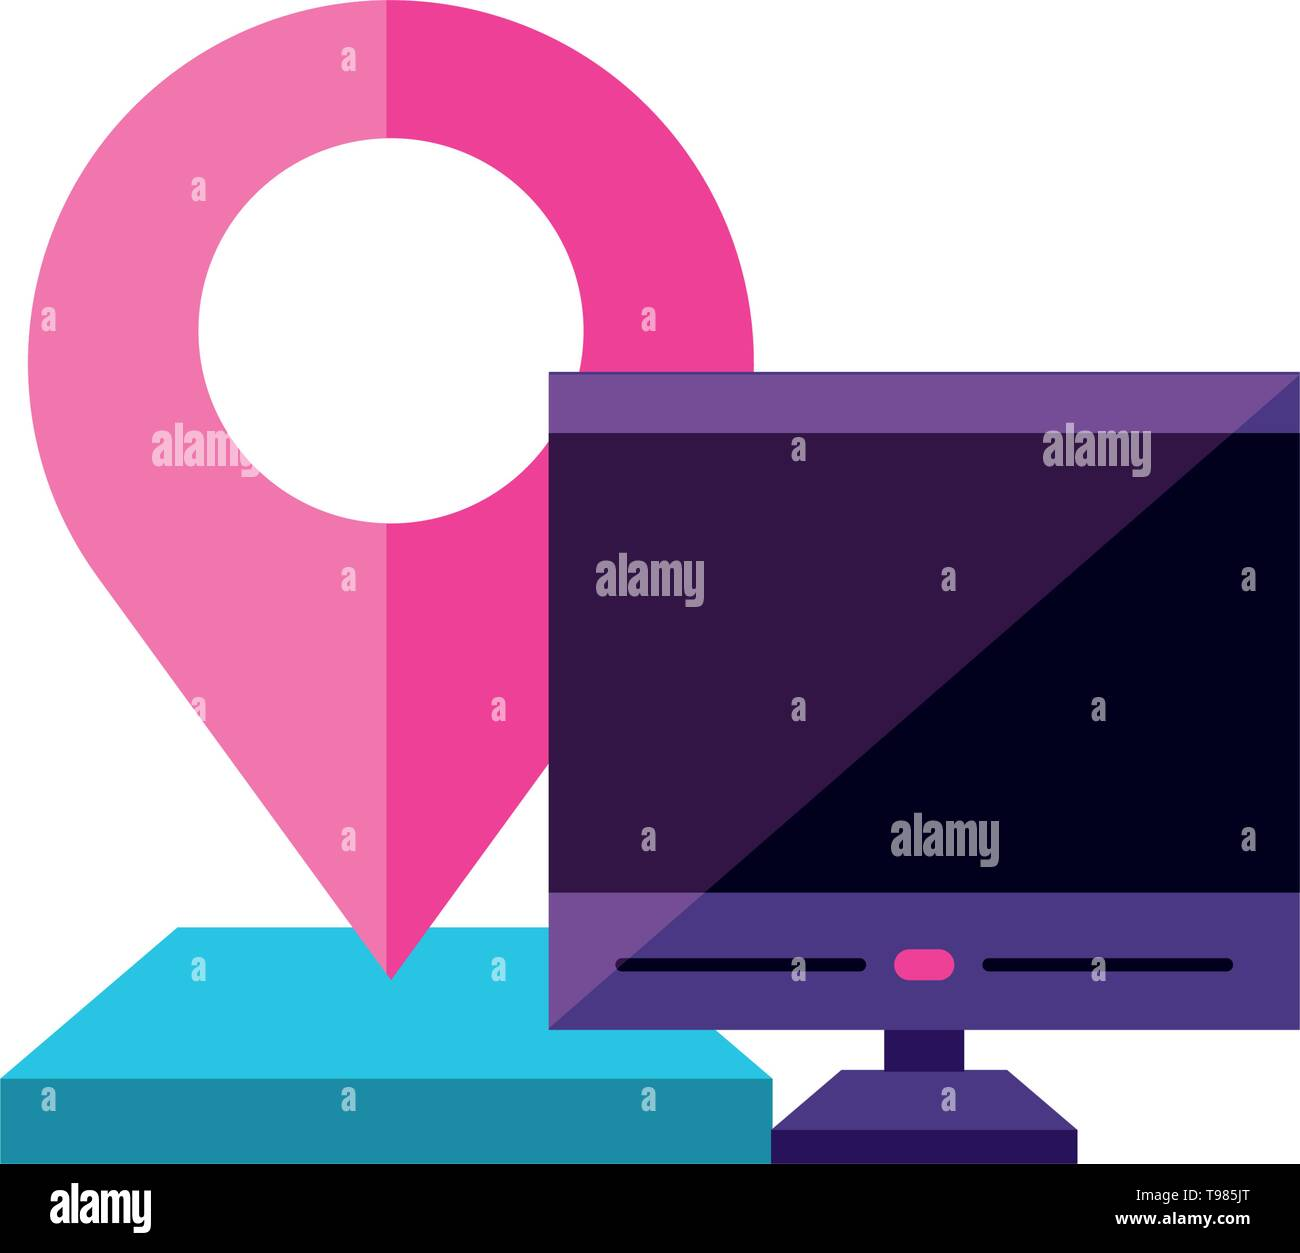 desktop with pin location gps app vector illustration design - Stock Image